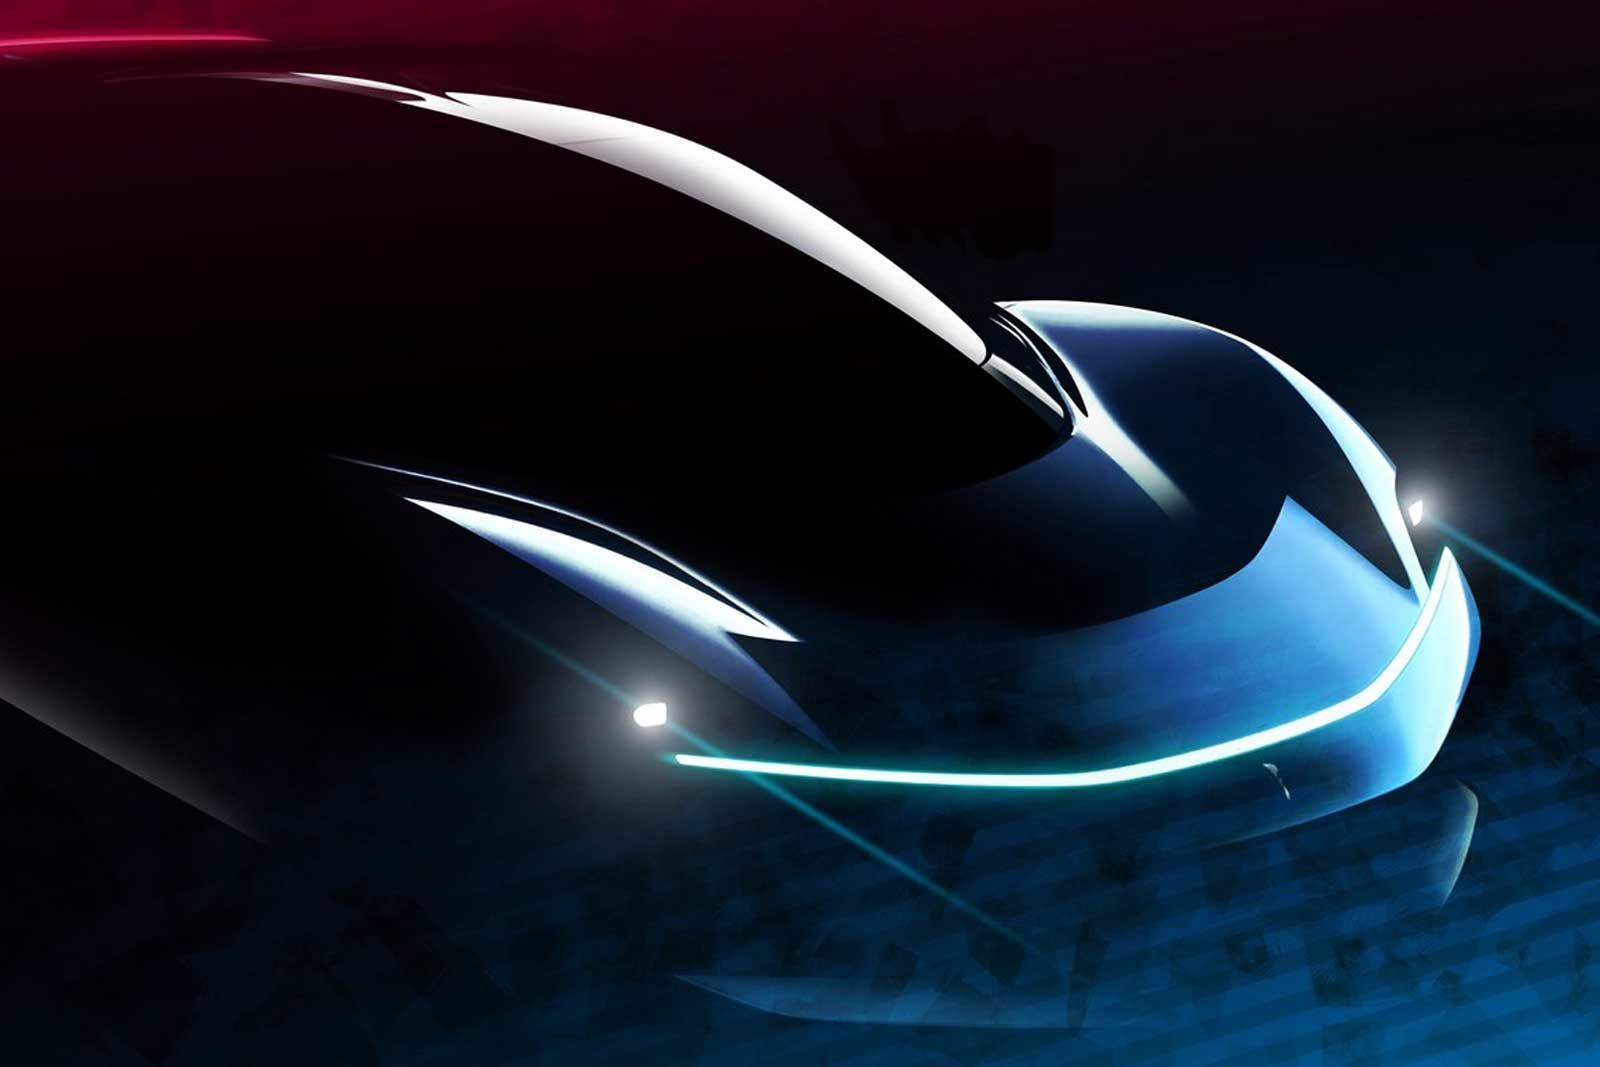 Электромобиль Pininfarina сумеет разгоняться до400 км/ч